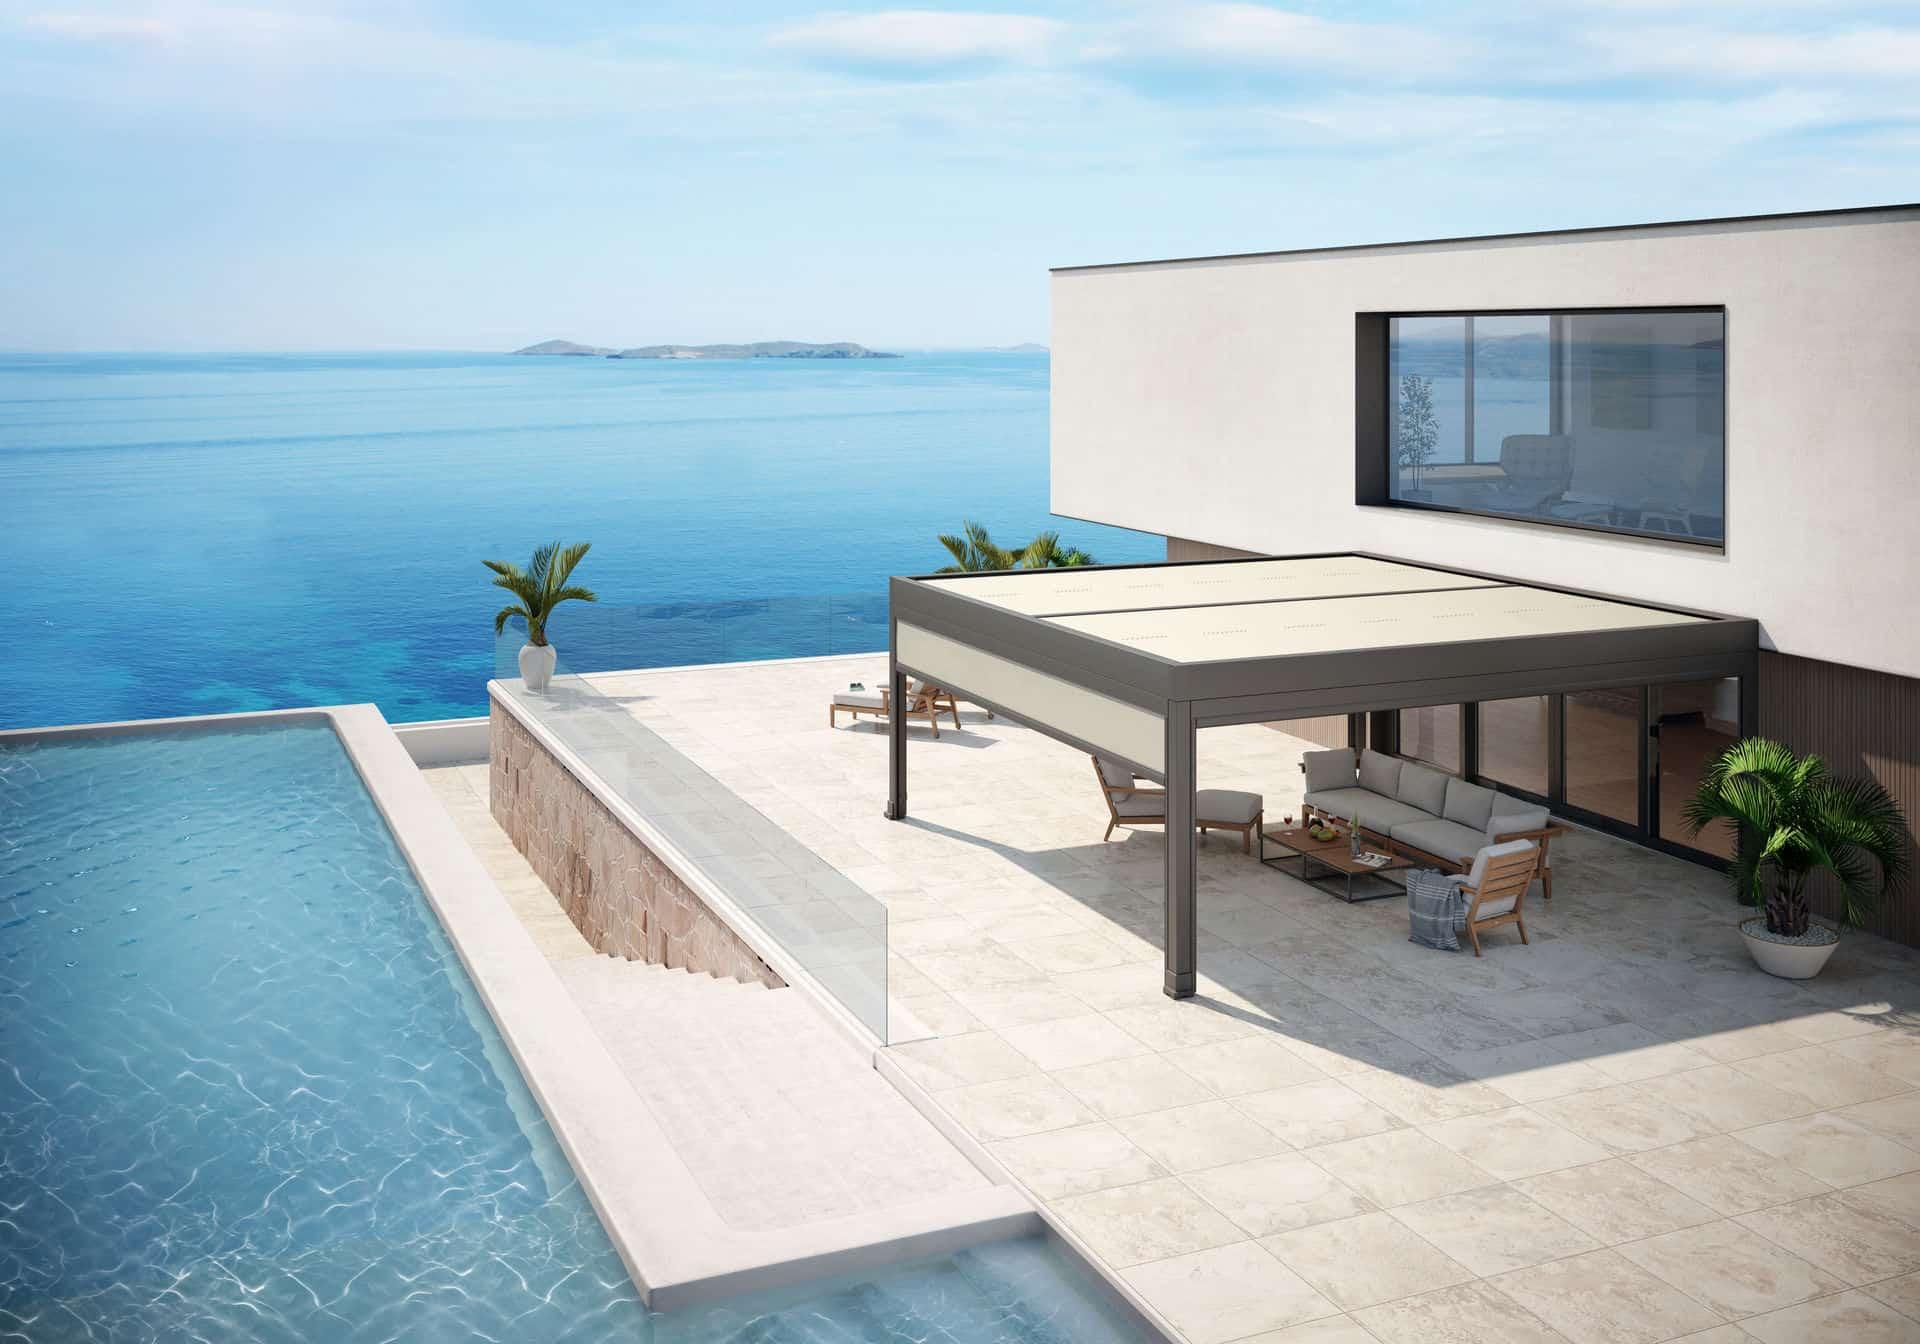 markilux Desingmarkise an einem Haus am Meer